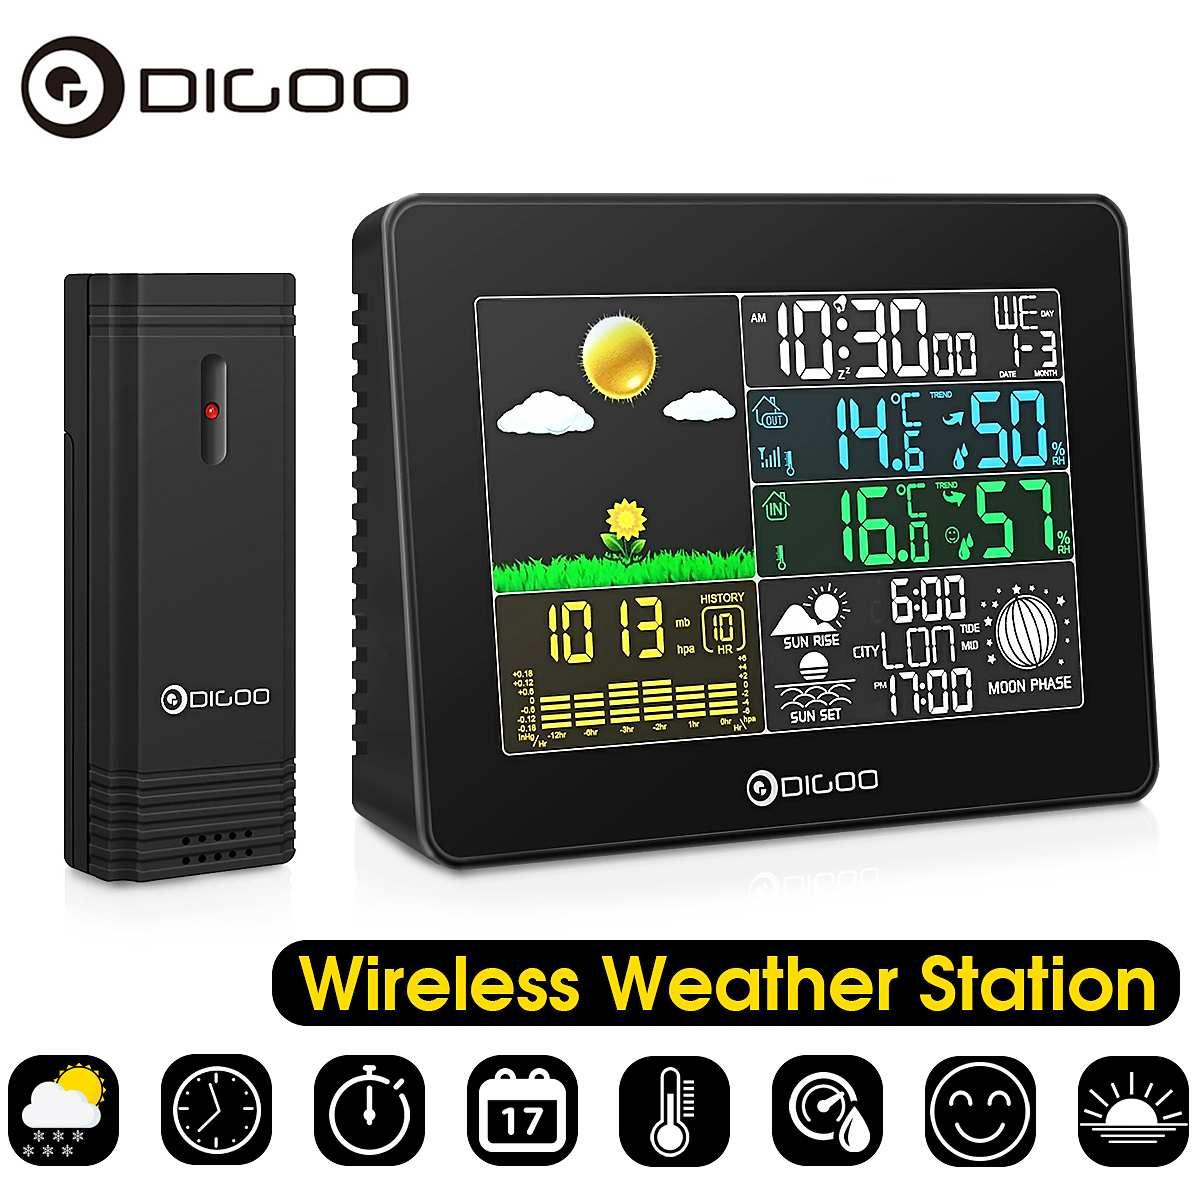 Digoo Wireless Big Screen Colour Digital Outdoor Temperature Humidity Thermometer Hygrometer Weather Forecast Sensor Alarm Clock